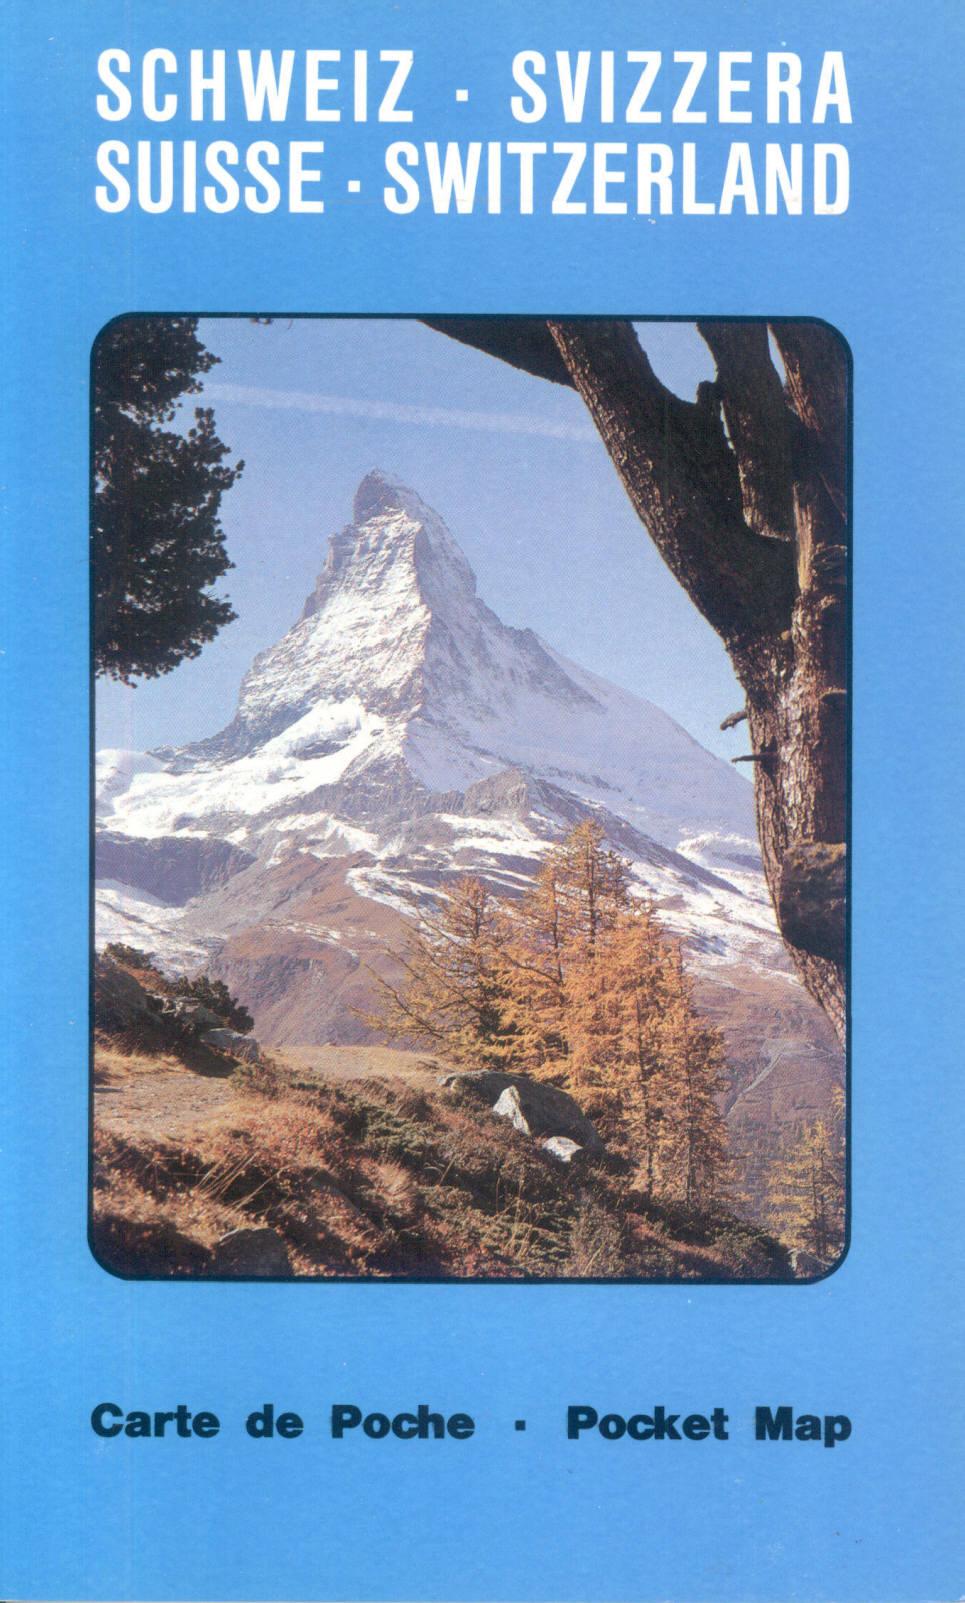 Switzerland Pocket Map 1:500,000